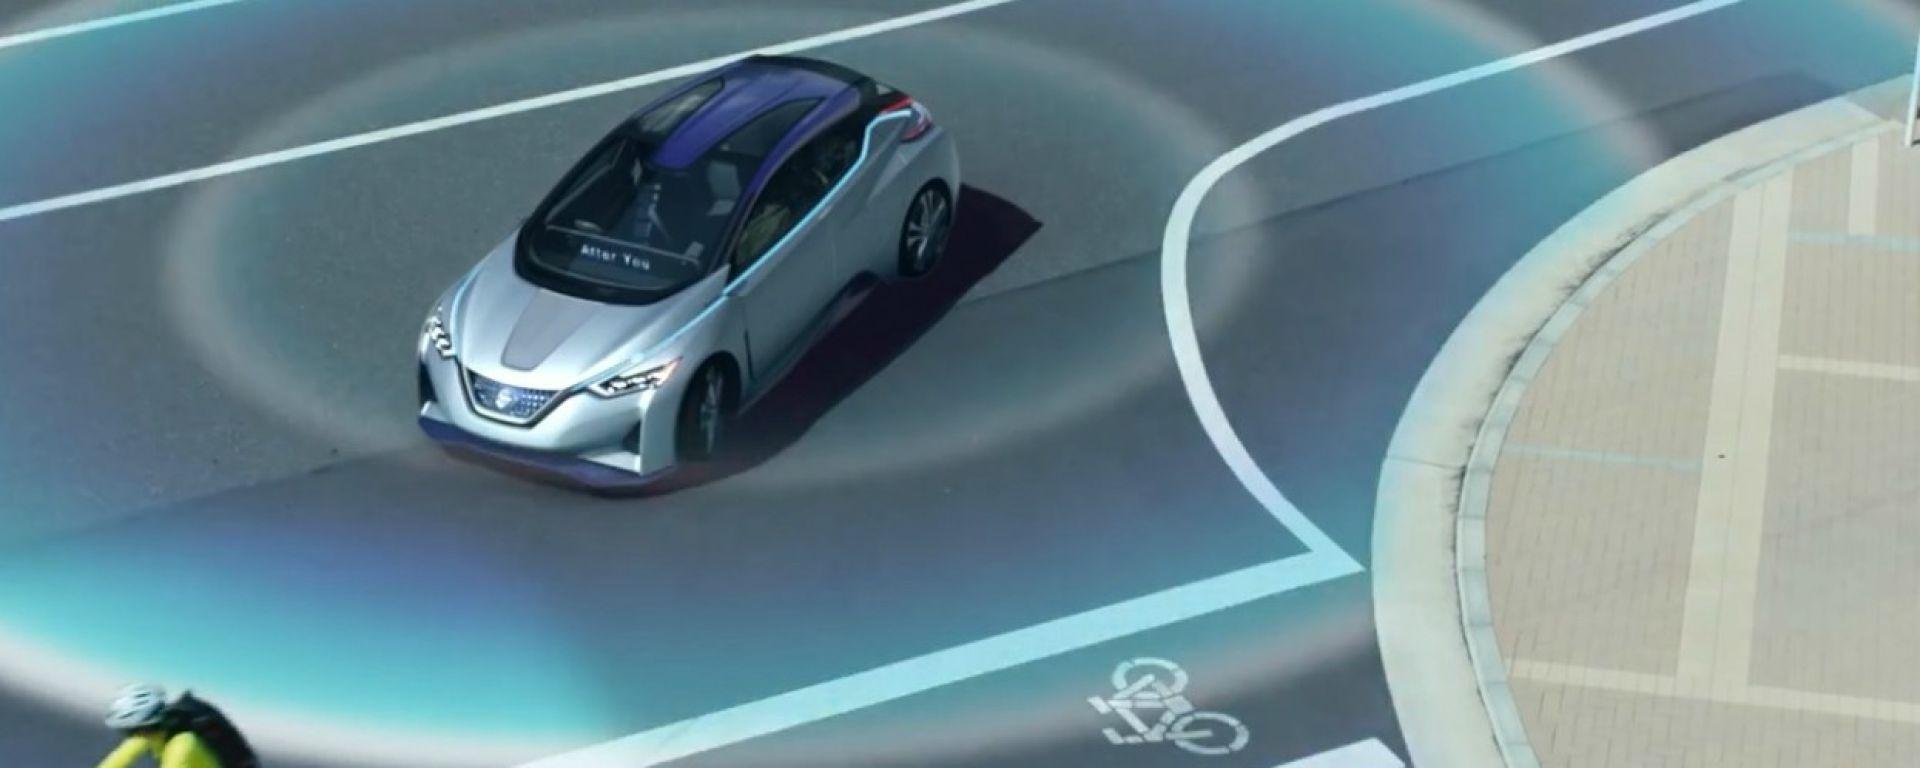 Nissan IDS Concept all'incrocio